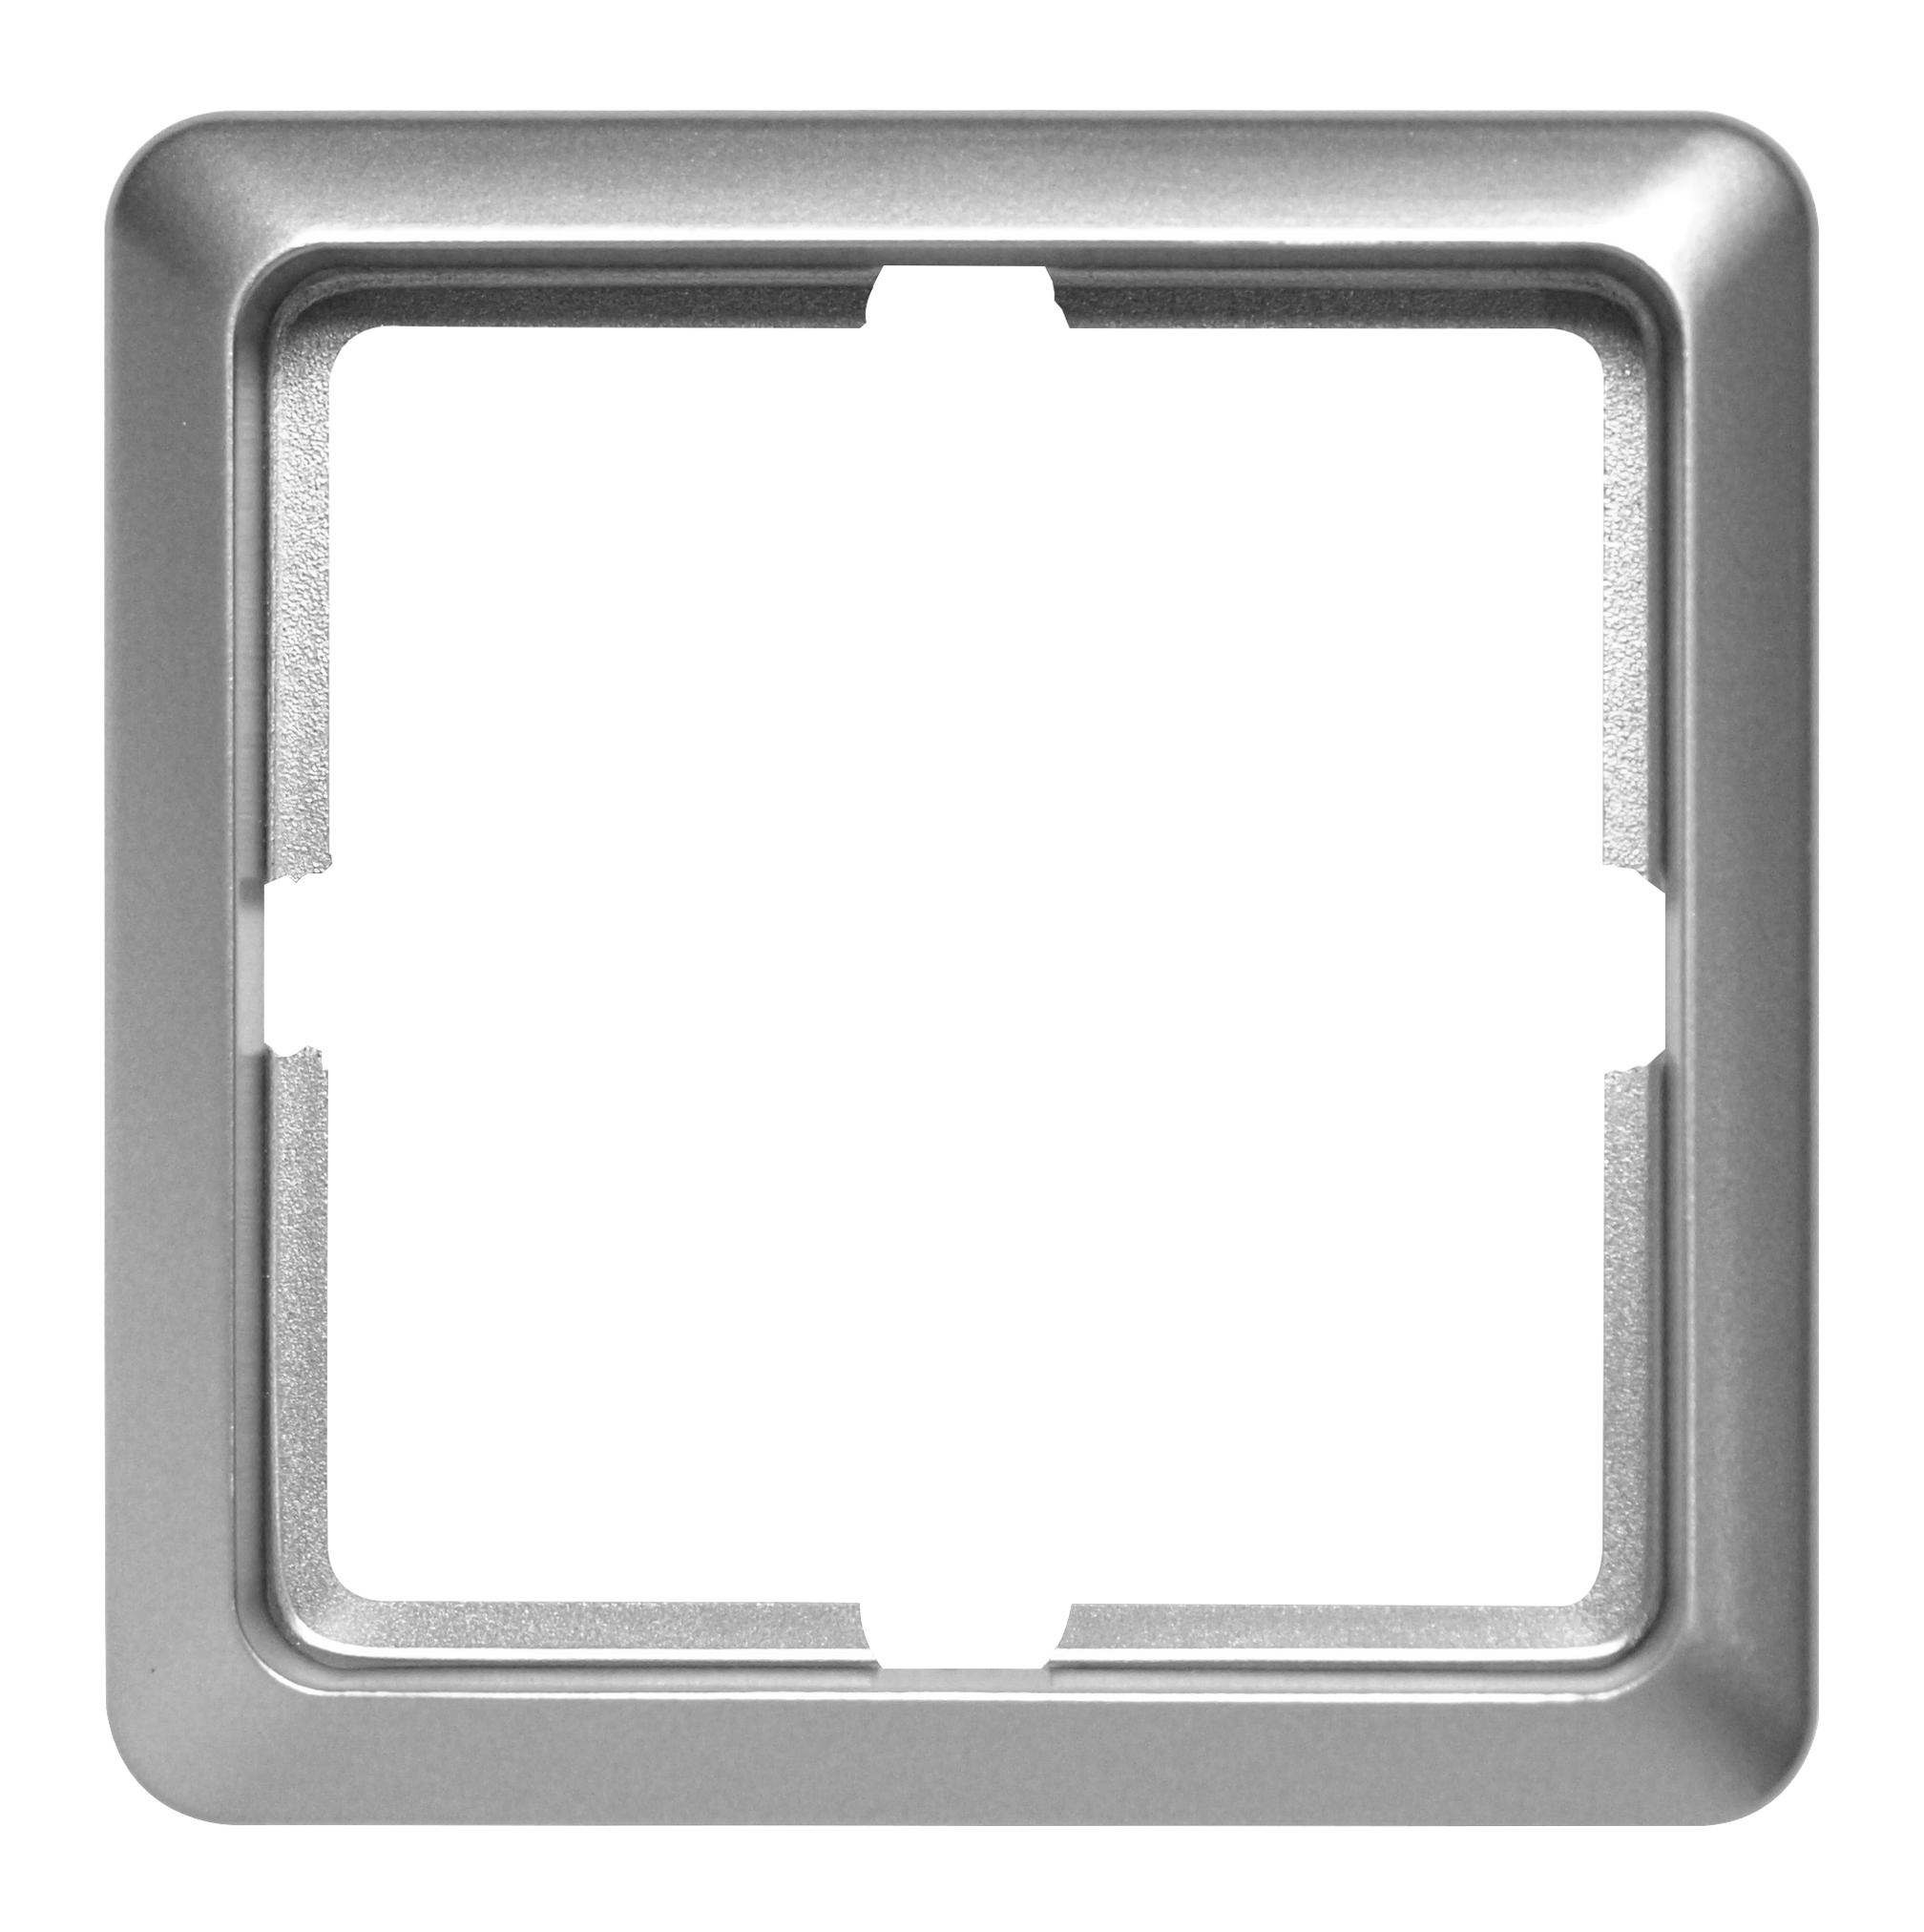 1 Stk Rahmen 1-fach, Edelstahleffekt Scala EL2041111-